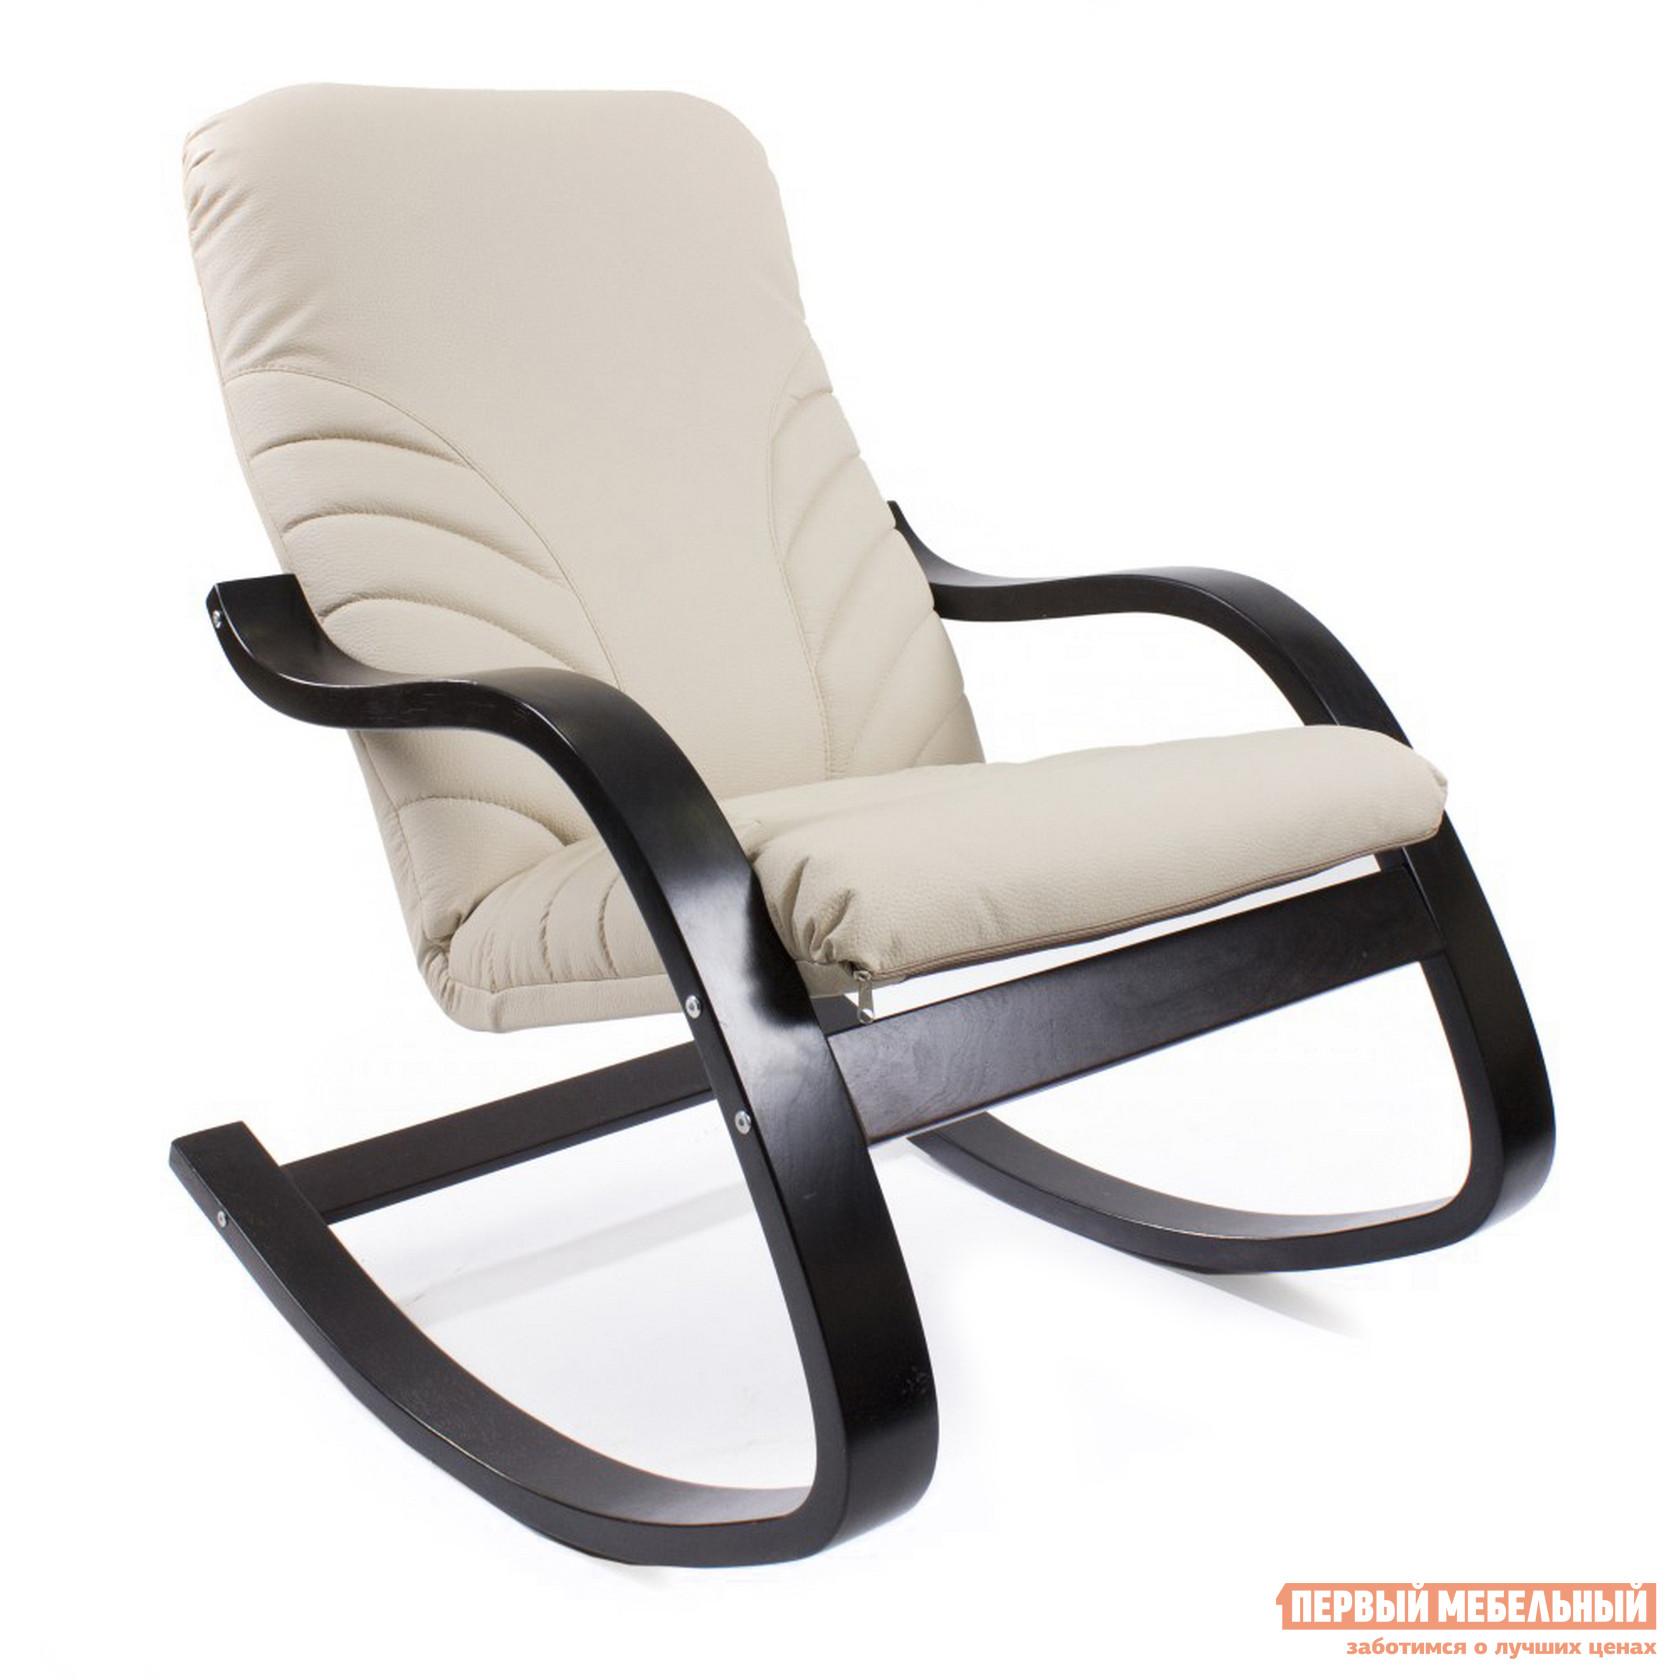 Кресло-качалка Грин Три Кресло качалка ЭЙР цены онлайн